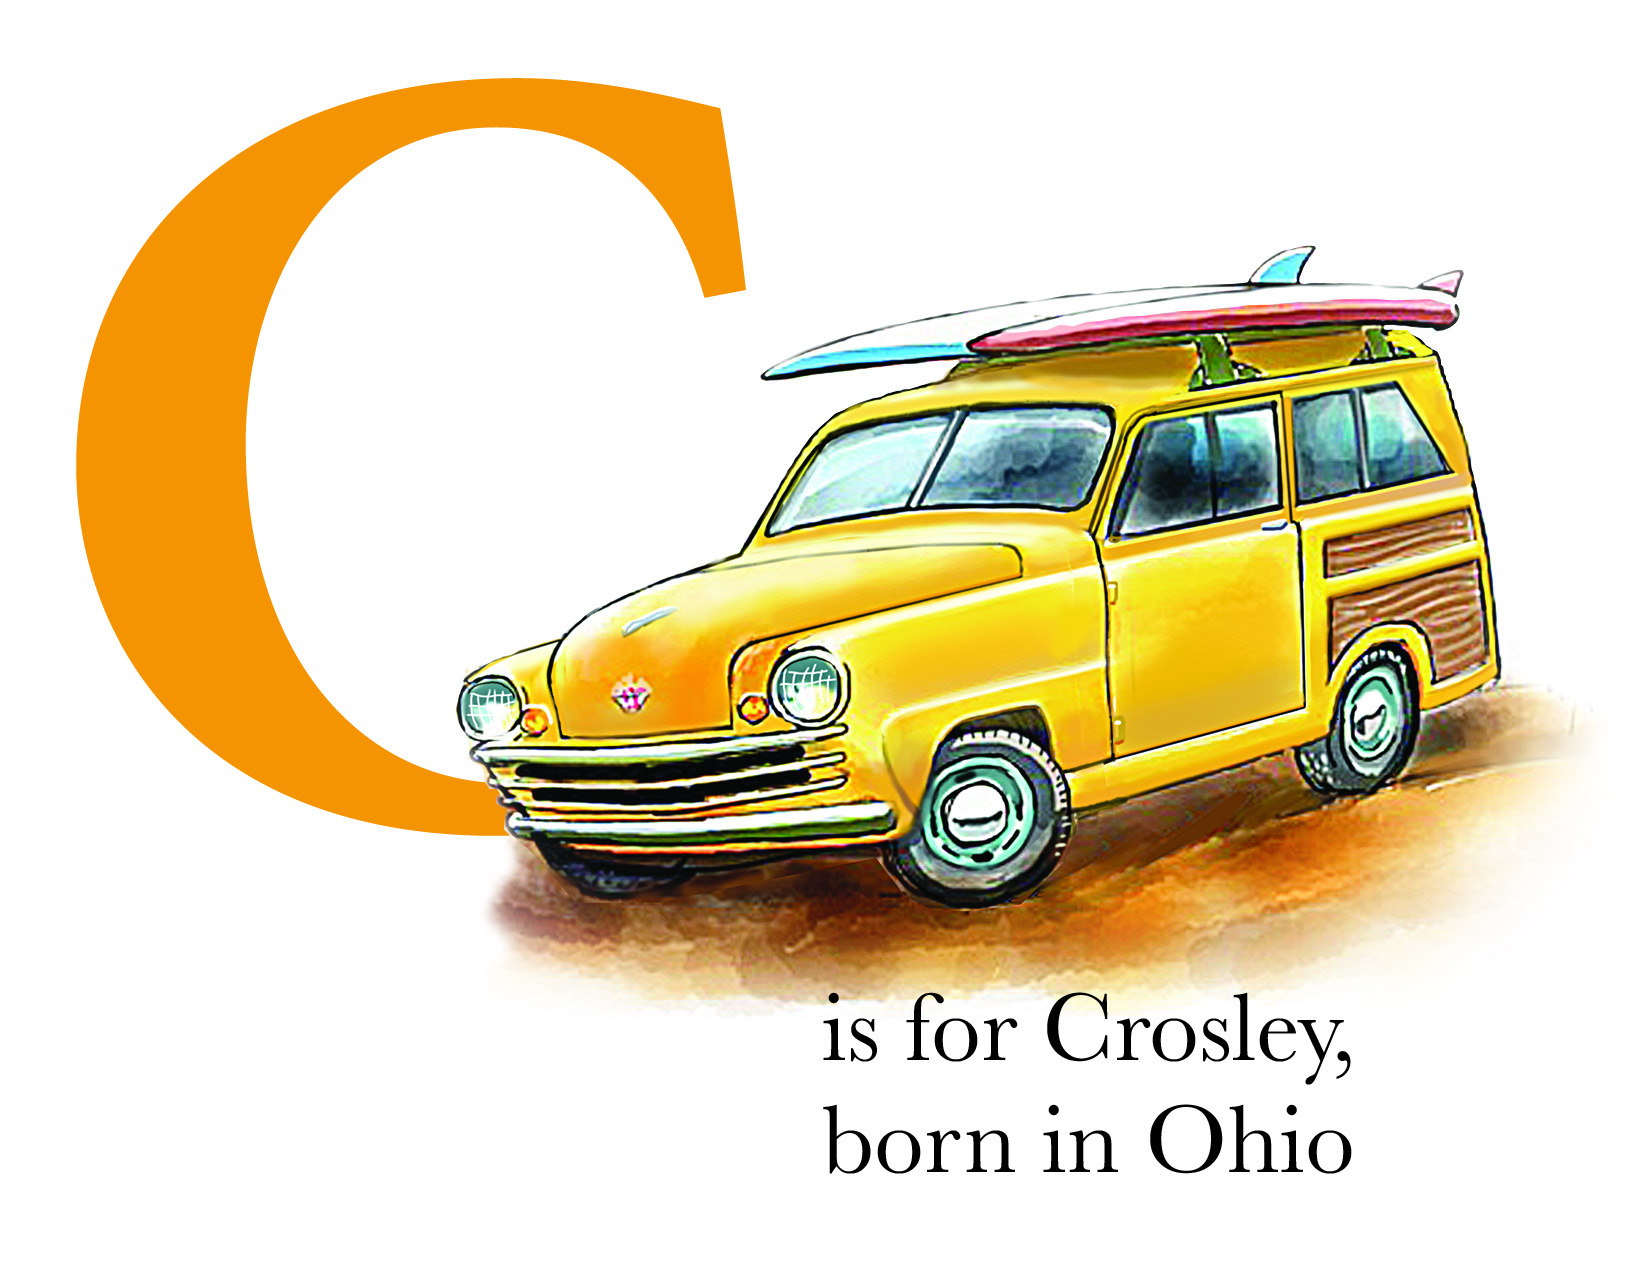 C is for Crosley